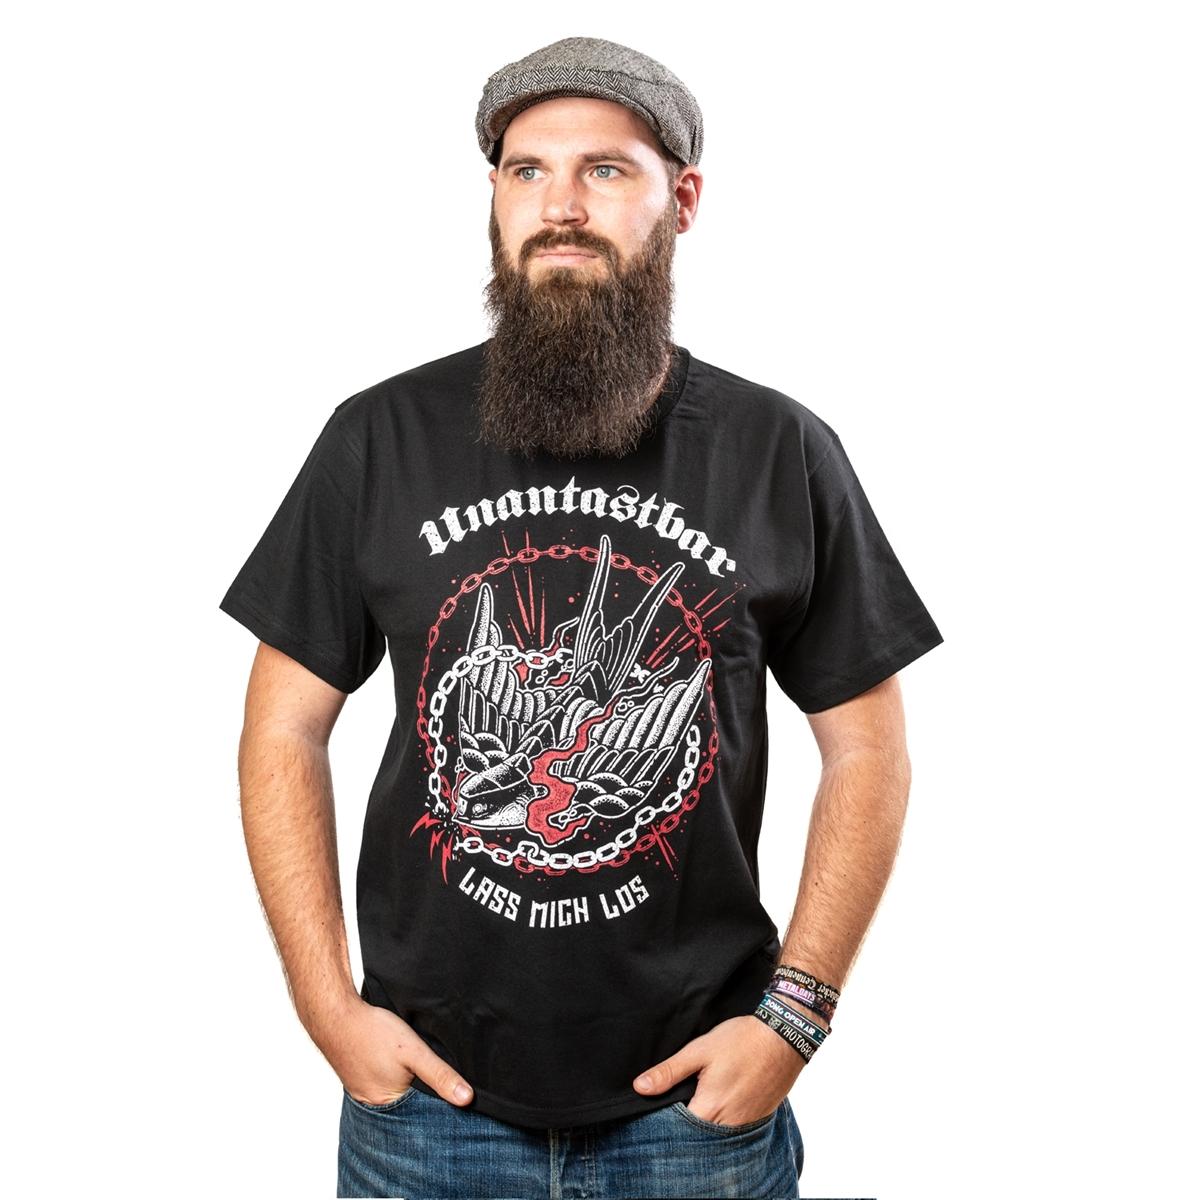 Unantastbar - Lass mich los, T-Shirt